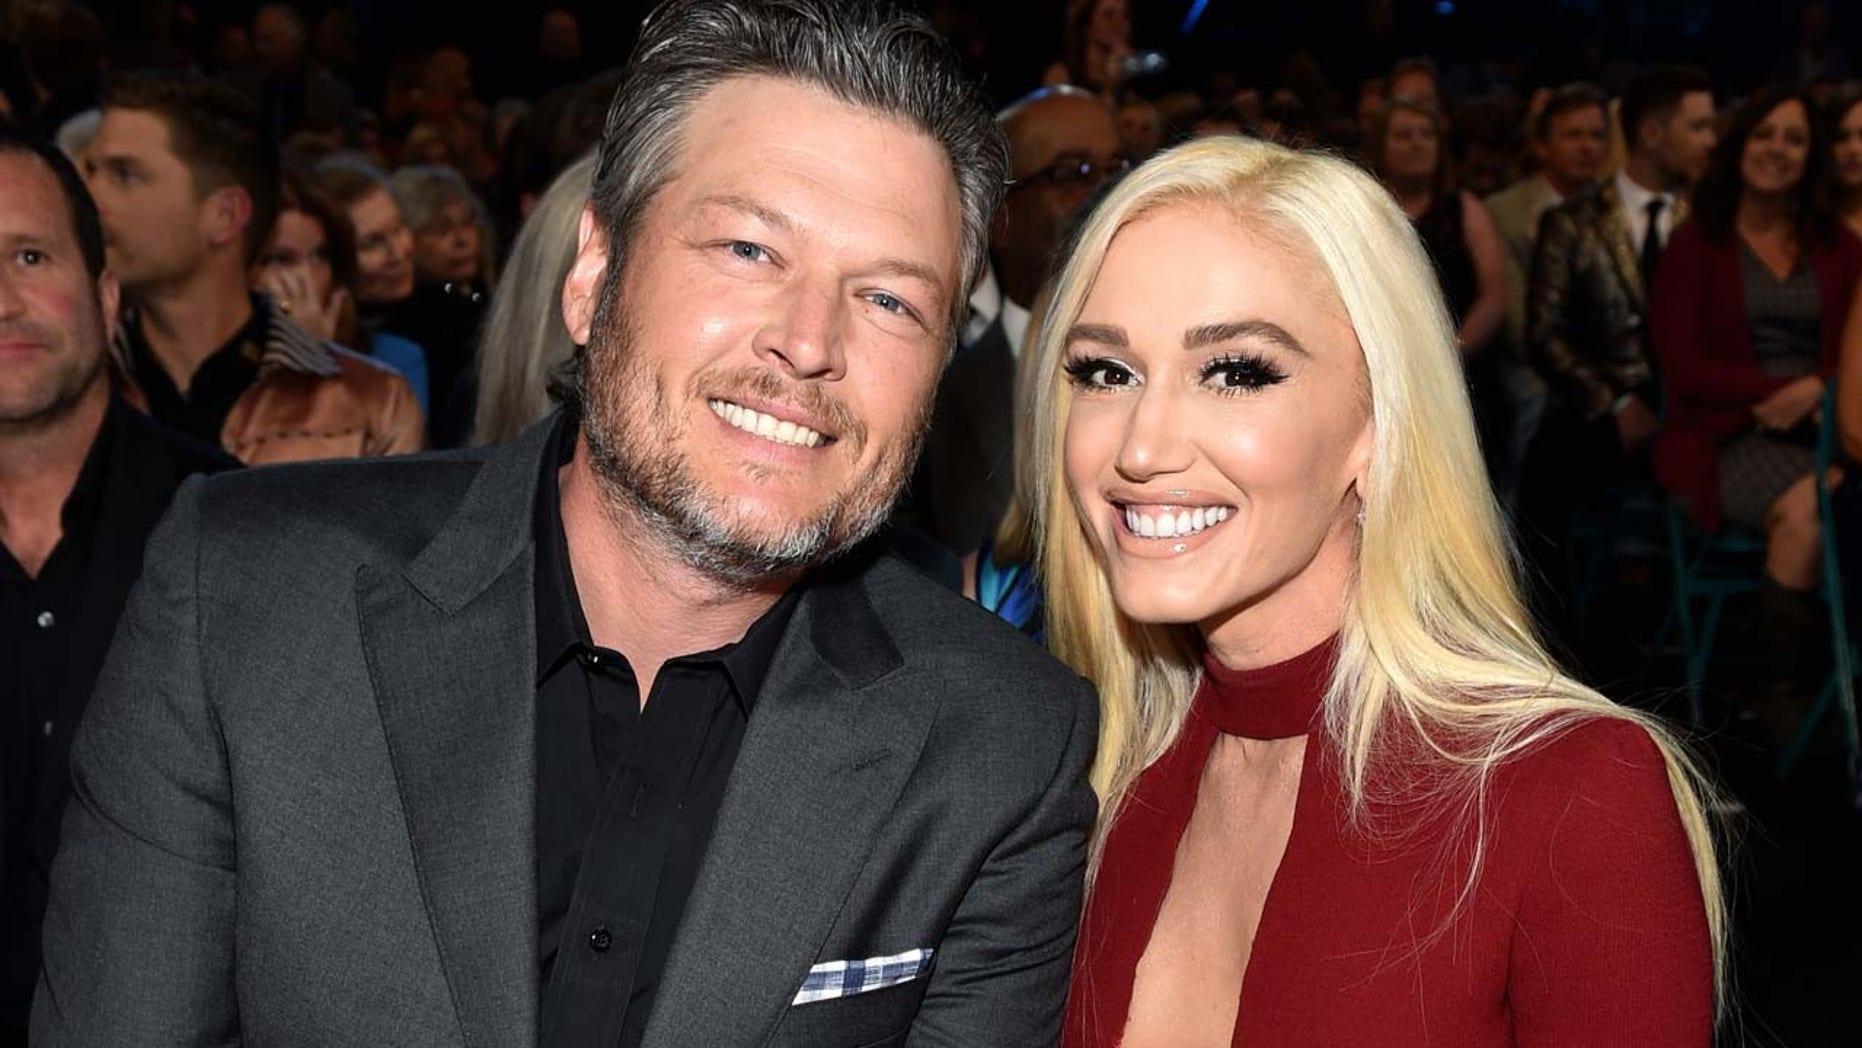 Blake Shelton brings girlfriend Gwen Stefani to the 2018 ACM Awards.